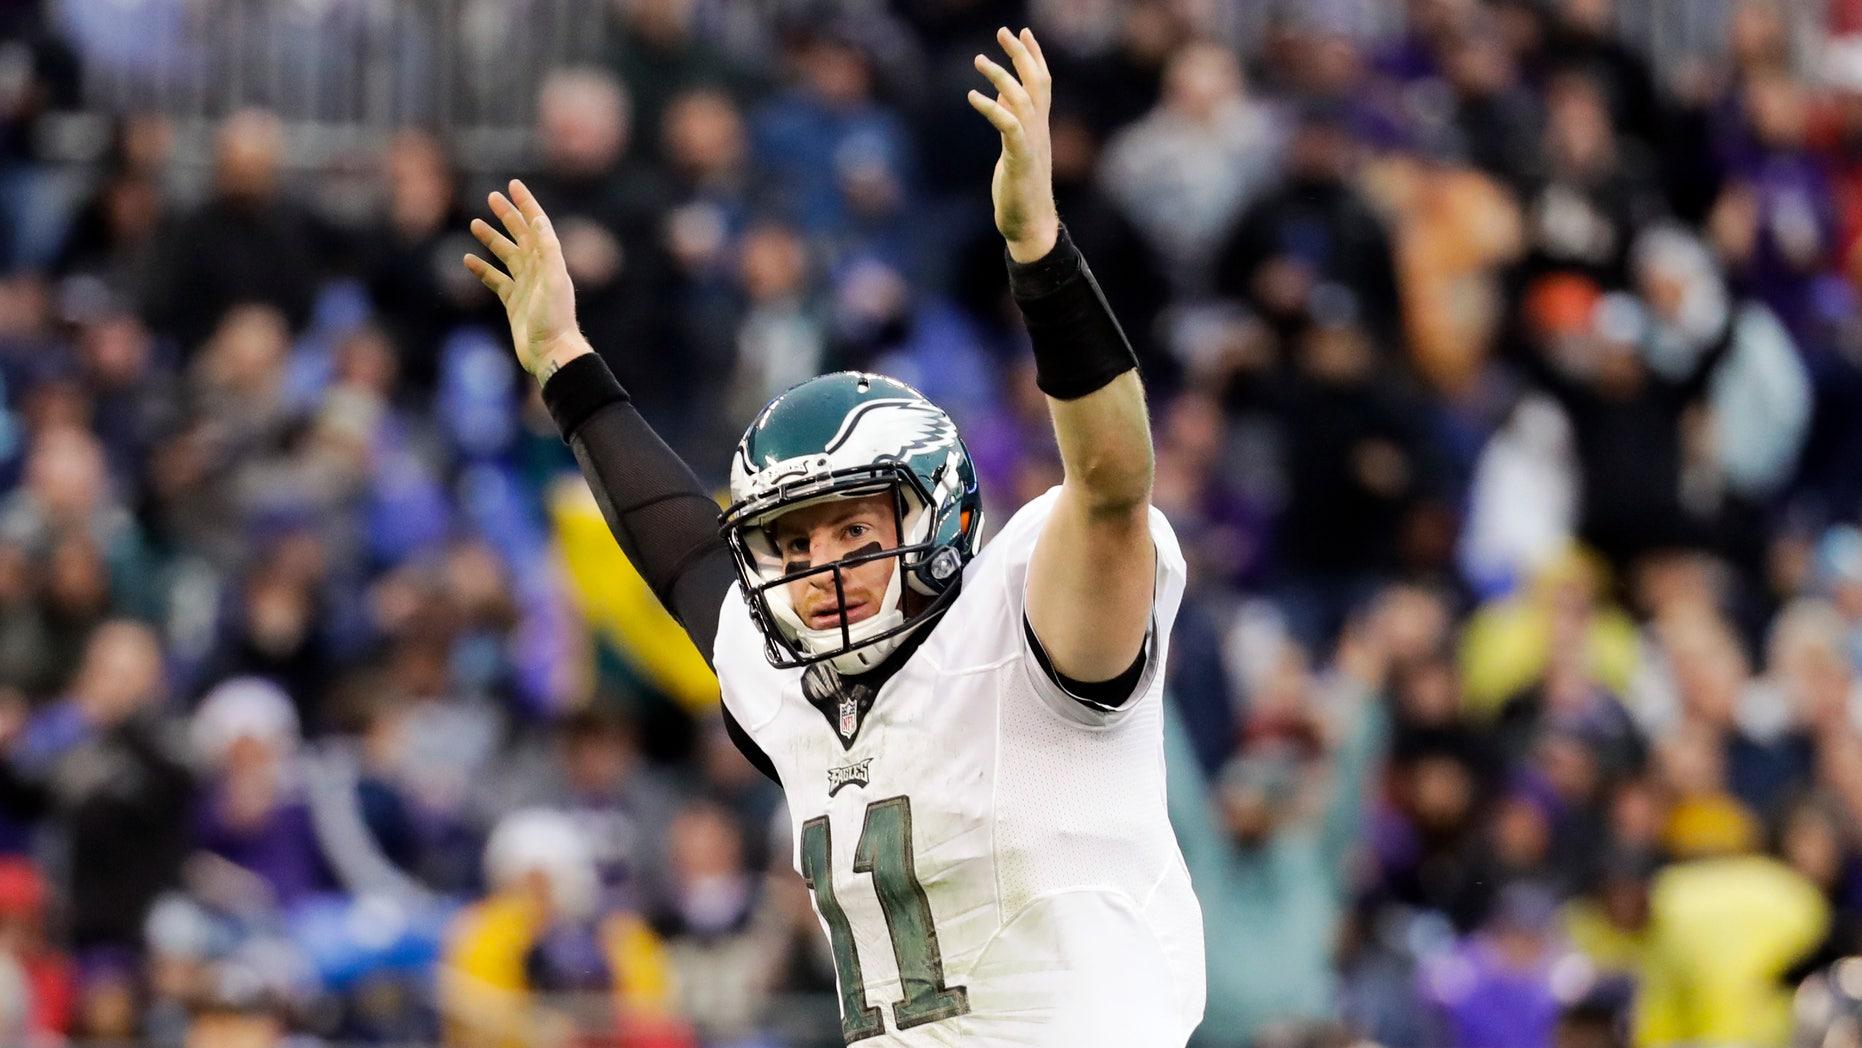 Eagles quarterback Carson Wentz celebrates a touchdown on Dec. 18.